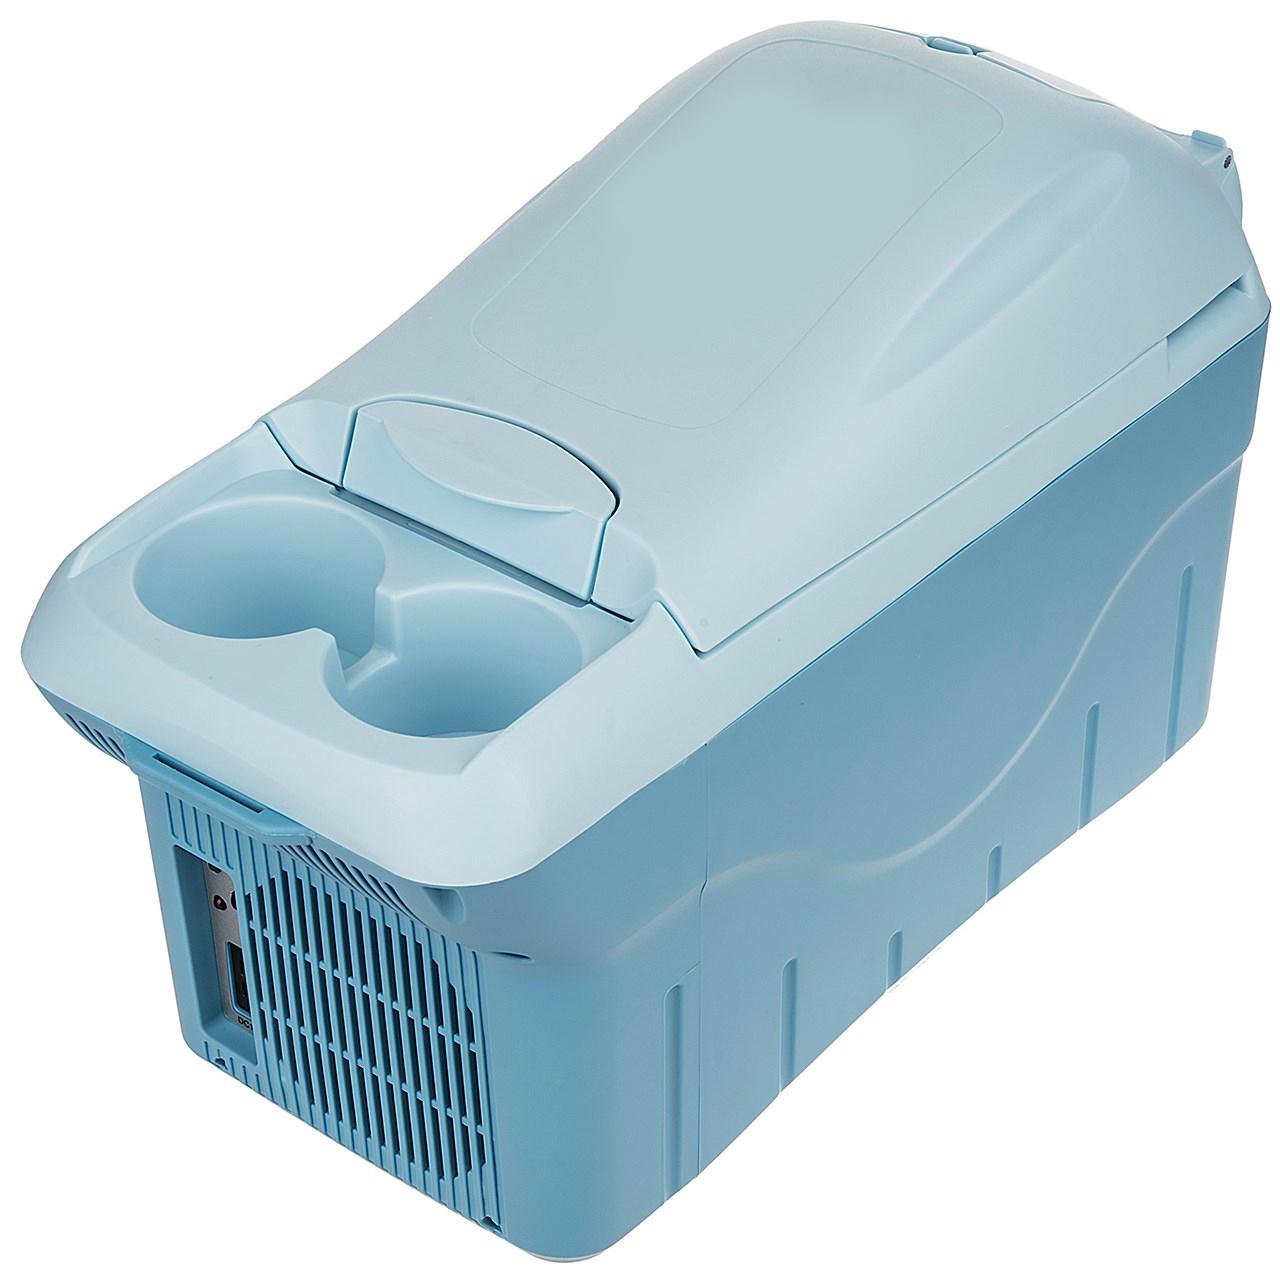 http://uupload.ir/files/7ugx_portable-electronic-refrigerator-8-litre.jpg